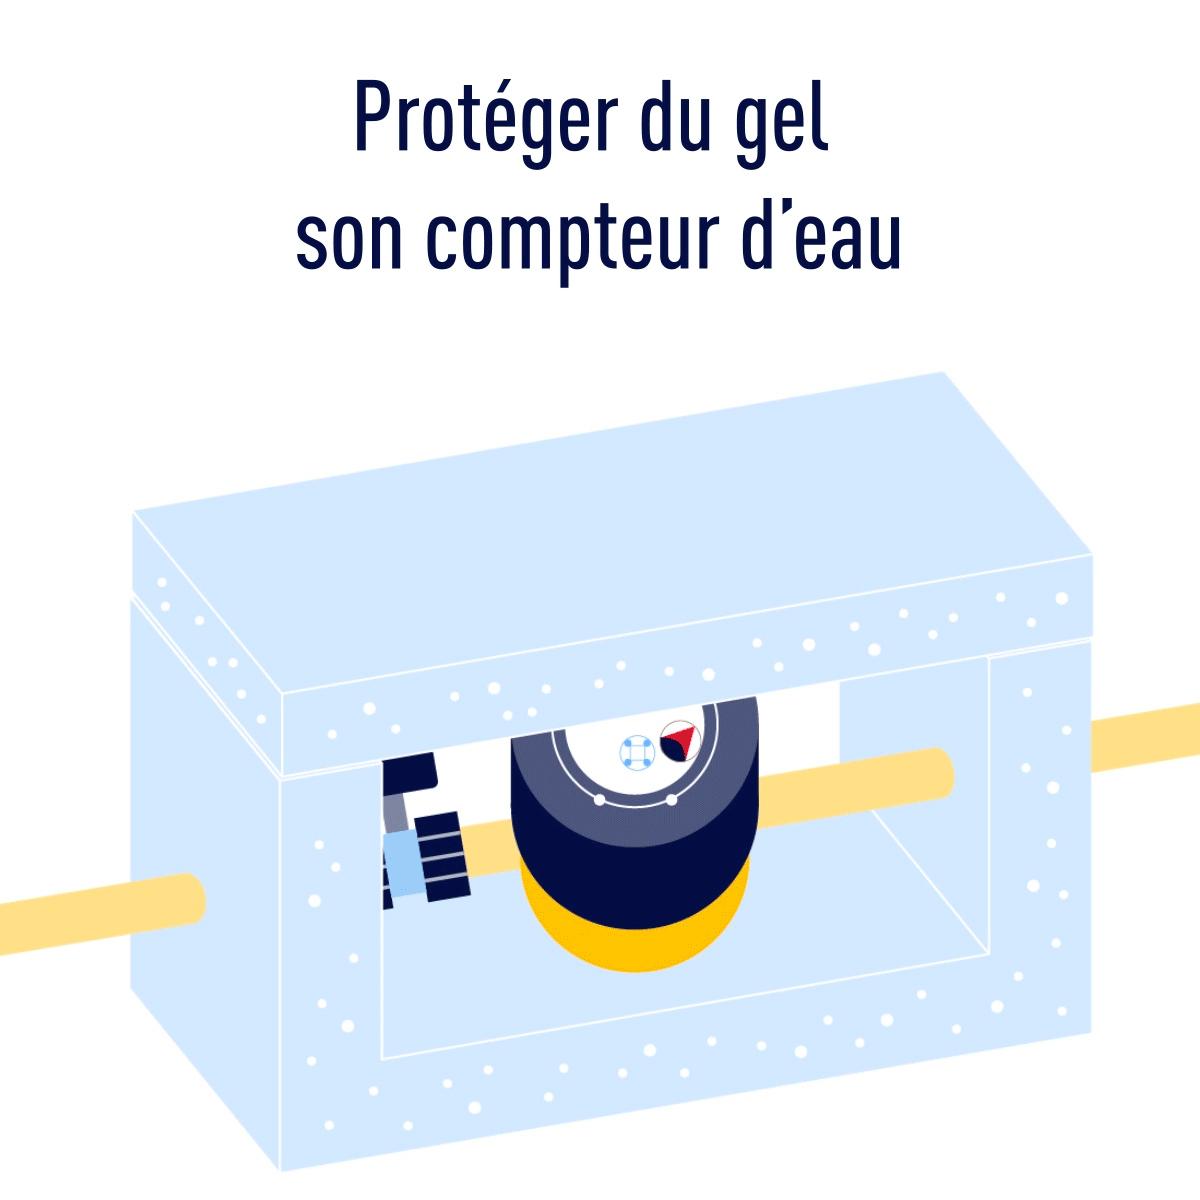 Master_Gaz et Eaux_Gel_Projet_ecran1.jpg